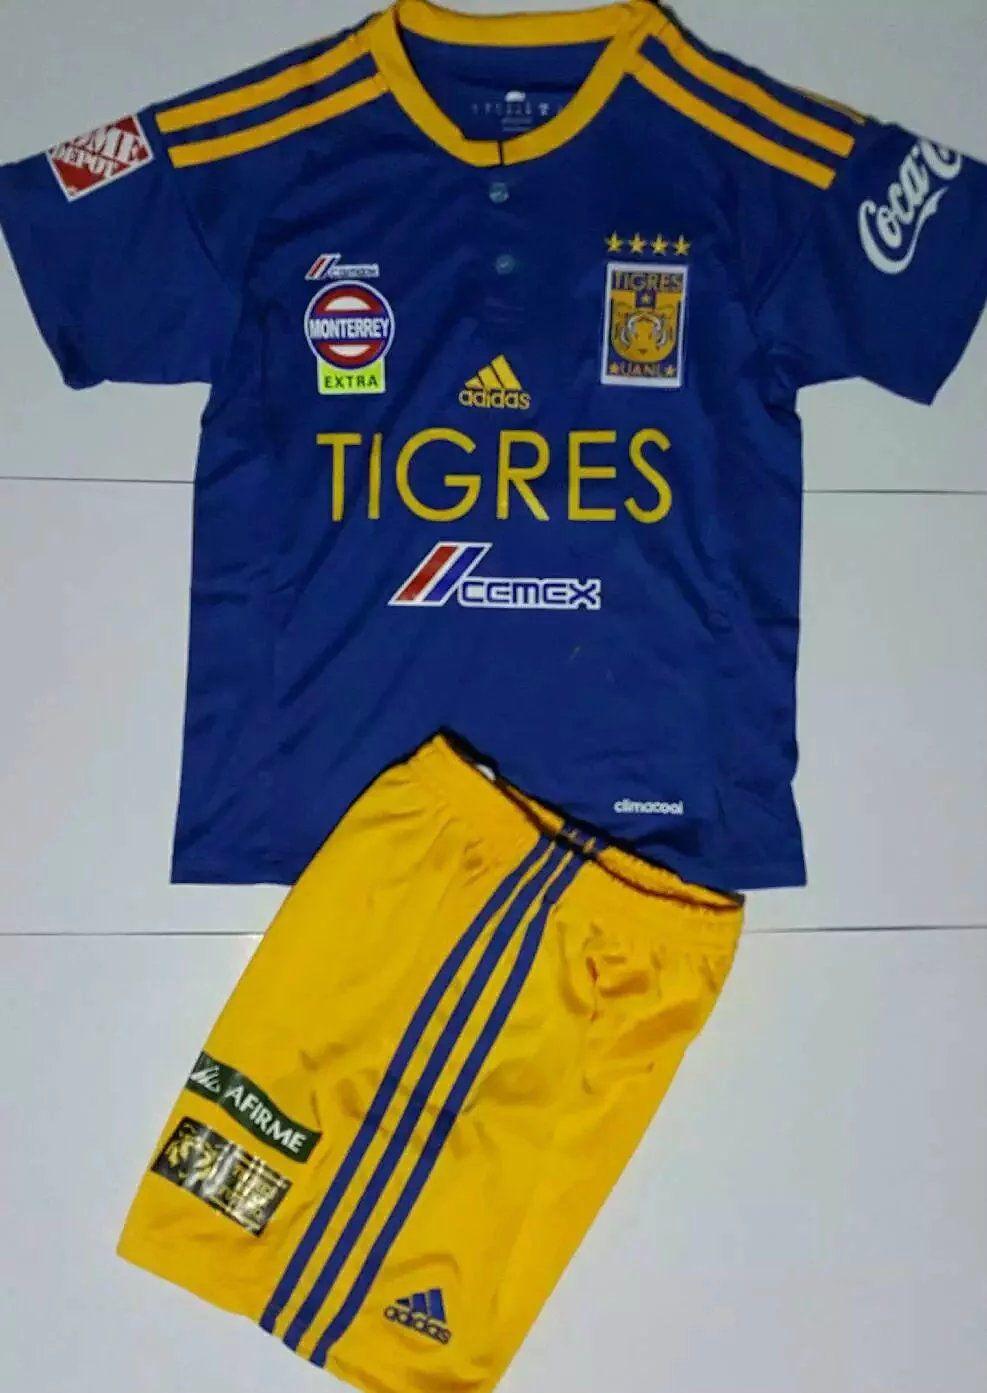 1bdd18acd Tigres away kids jersey Youth Soccer